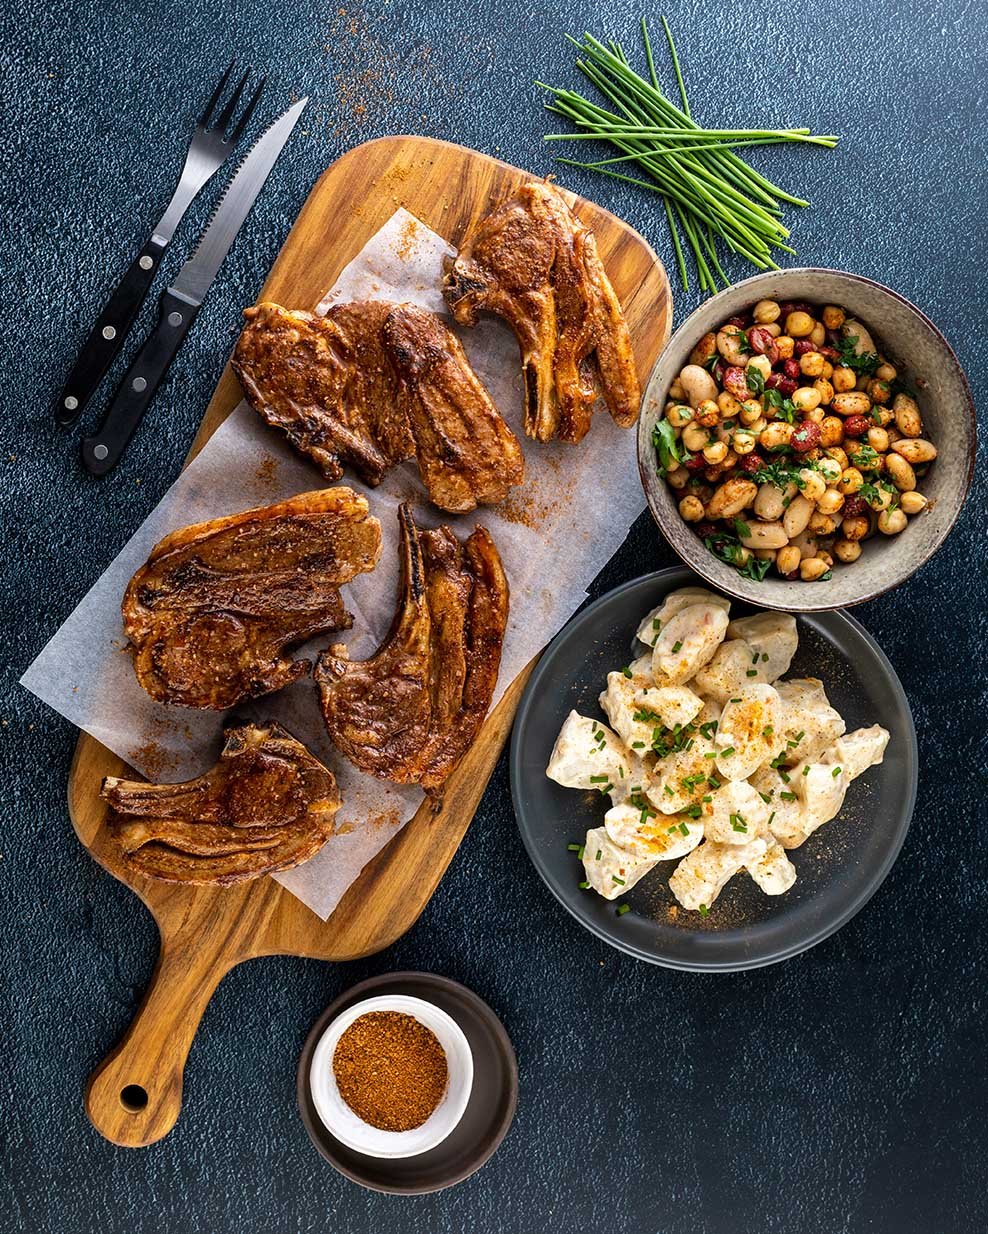 Lamb Chops, Potato salad and Sweet & Sour Beans